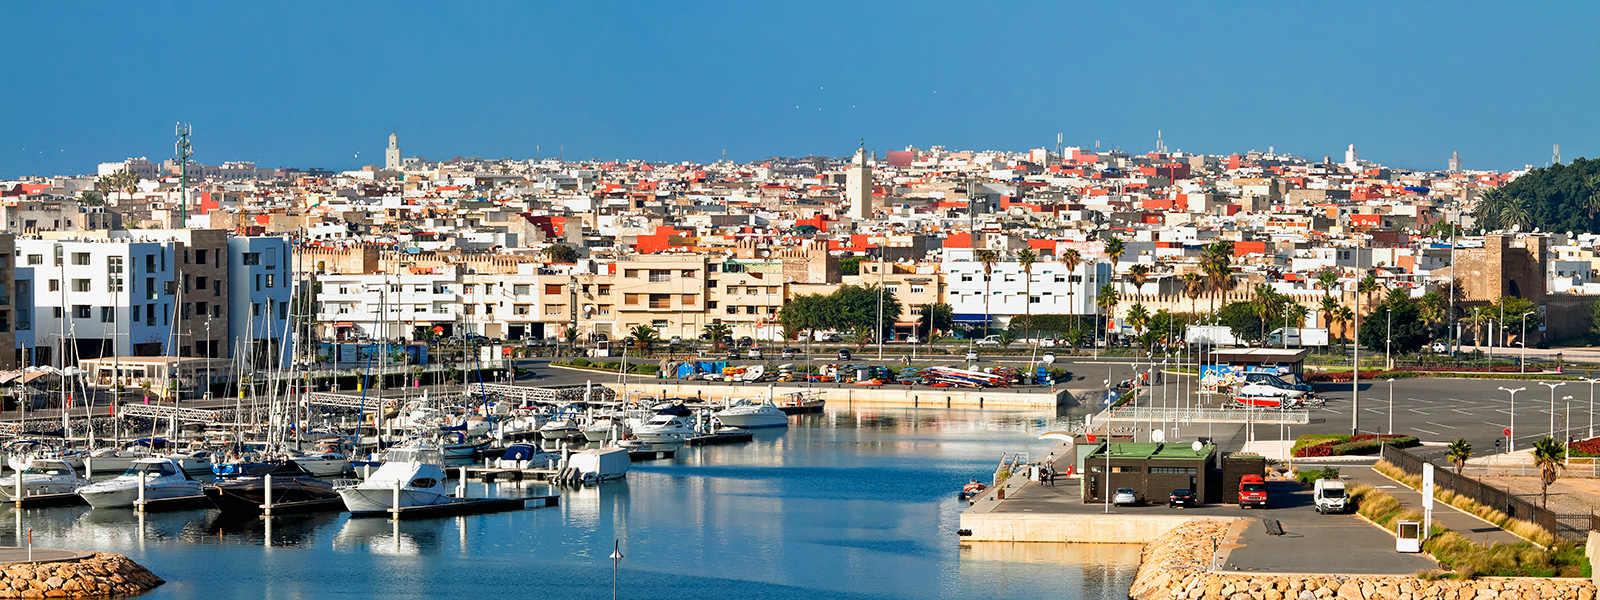 Marokkaanse dating site USA genetische matchmaking